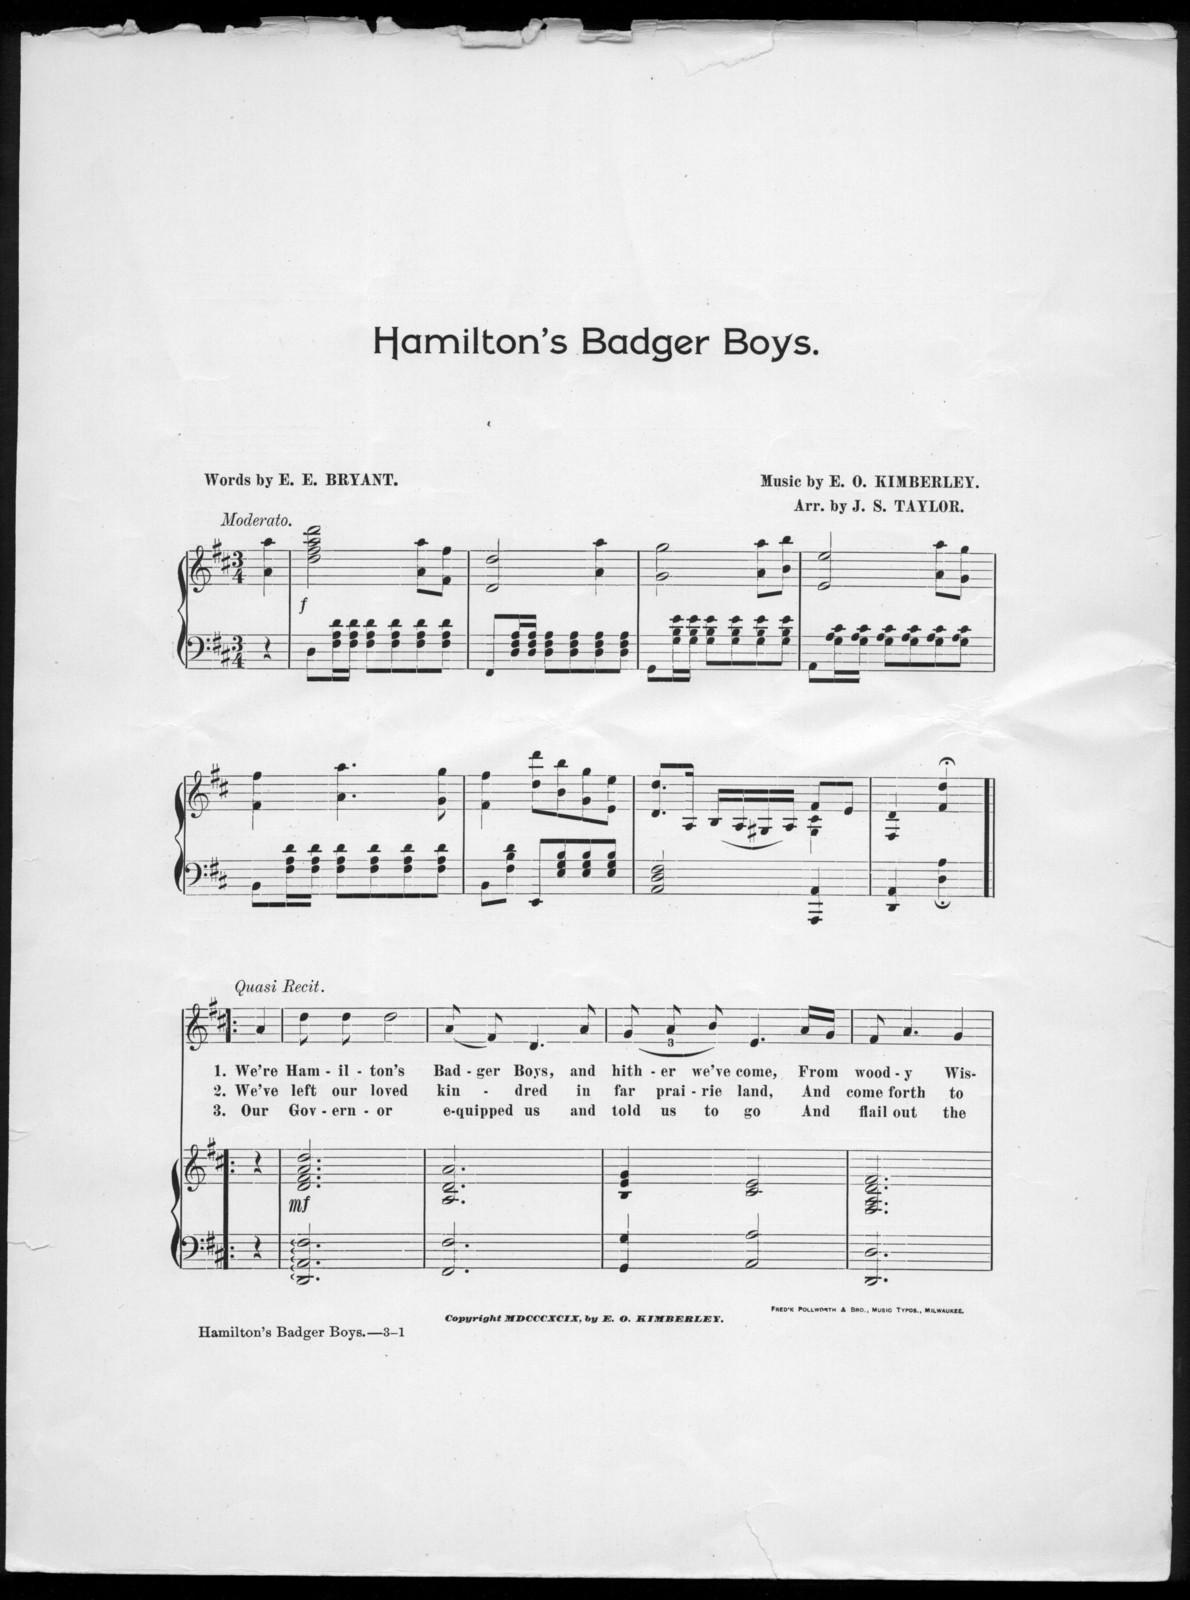 Hamilton's badger boys